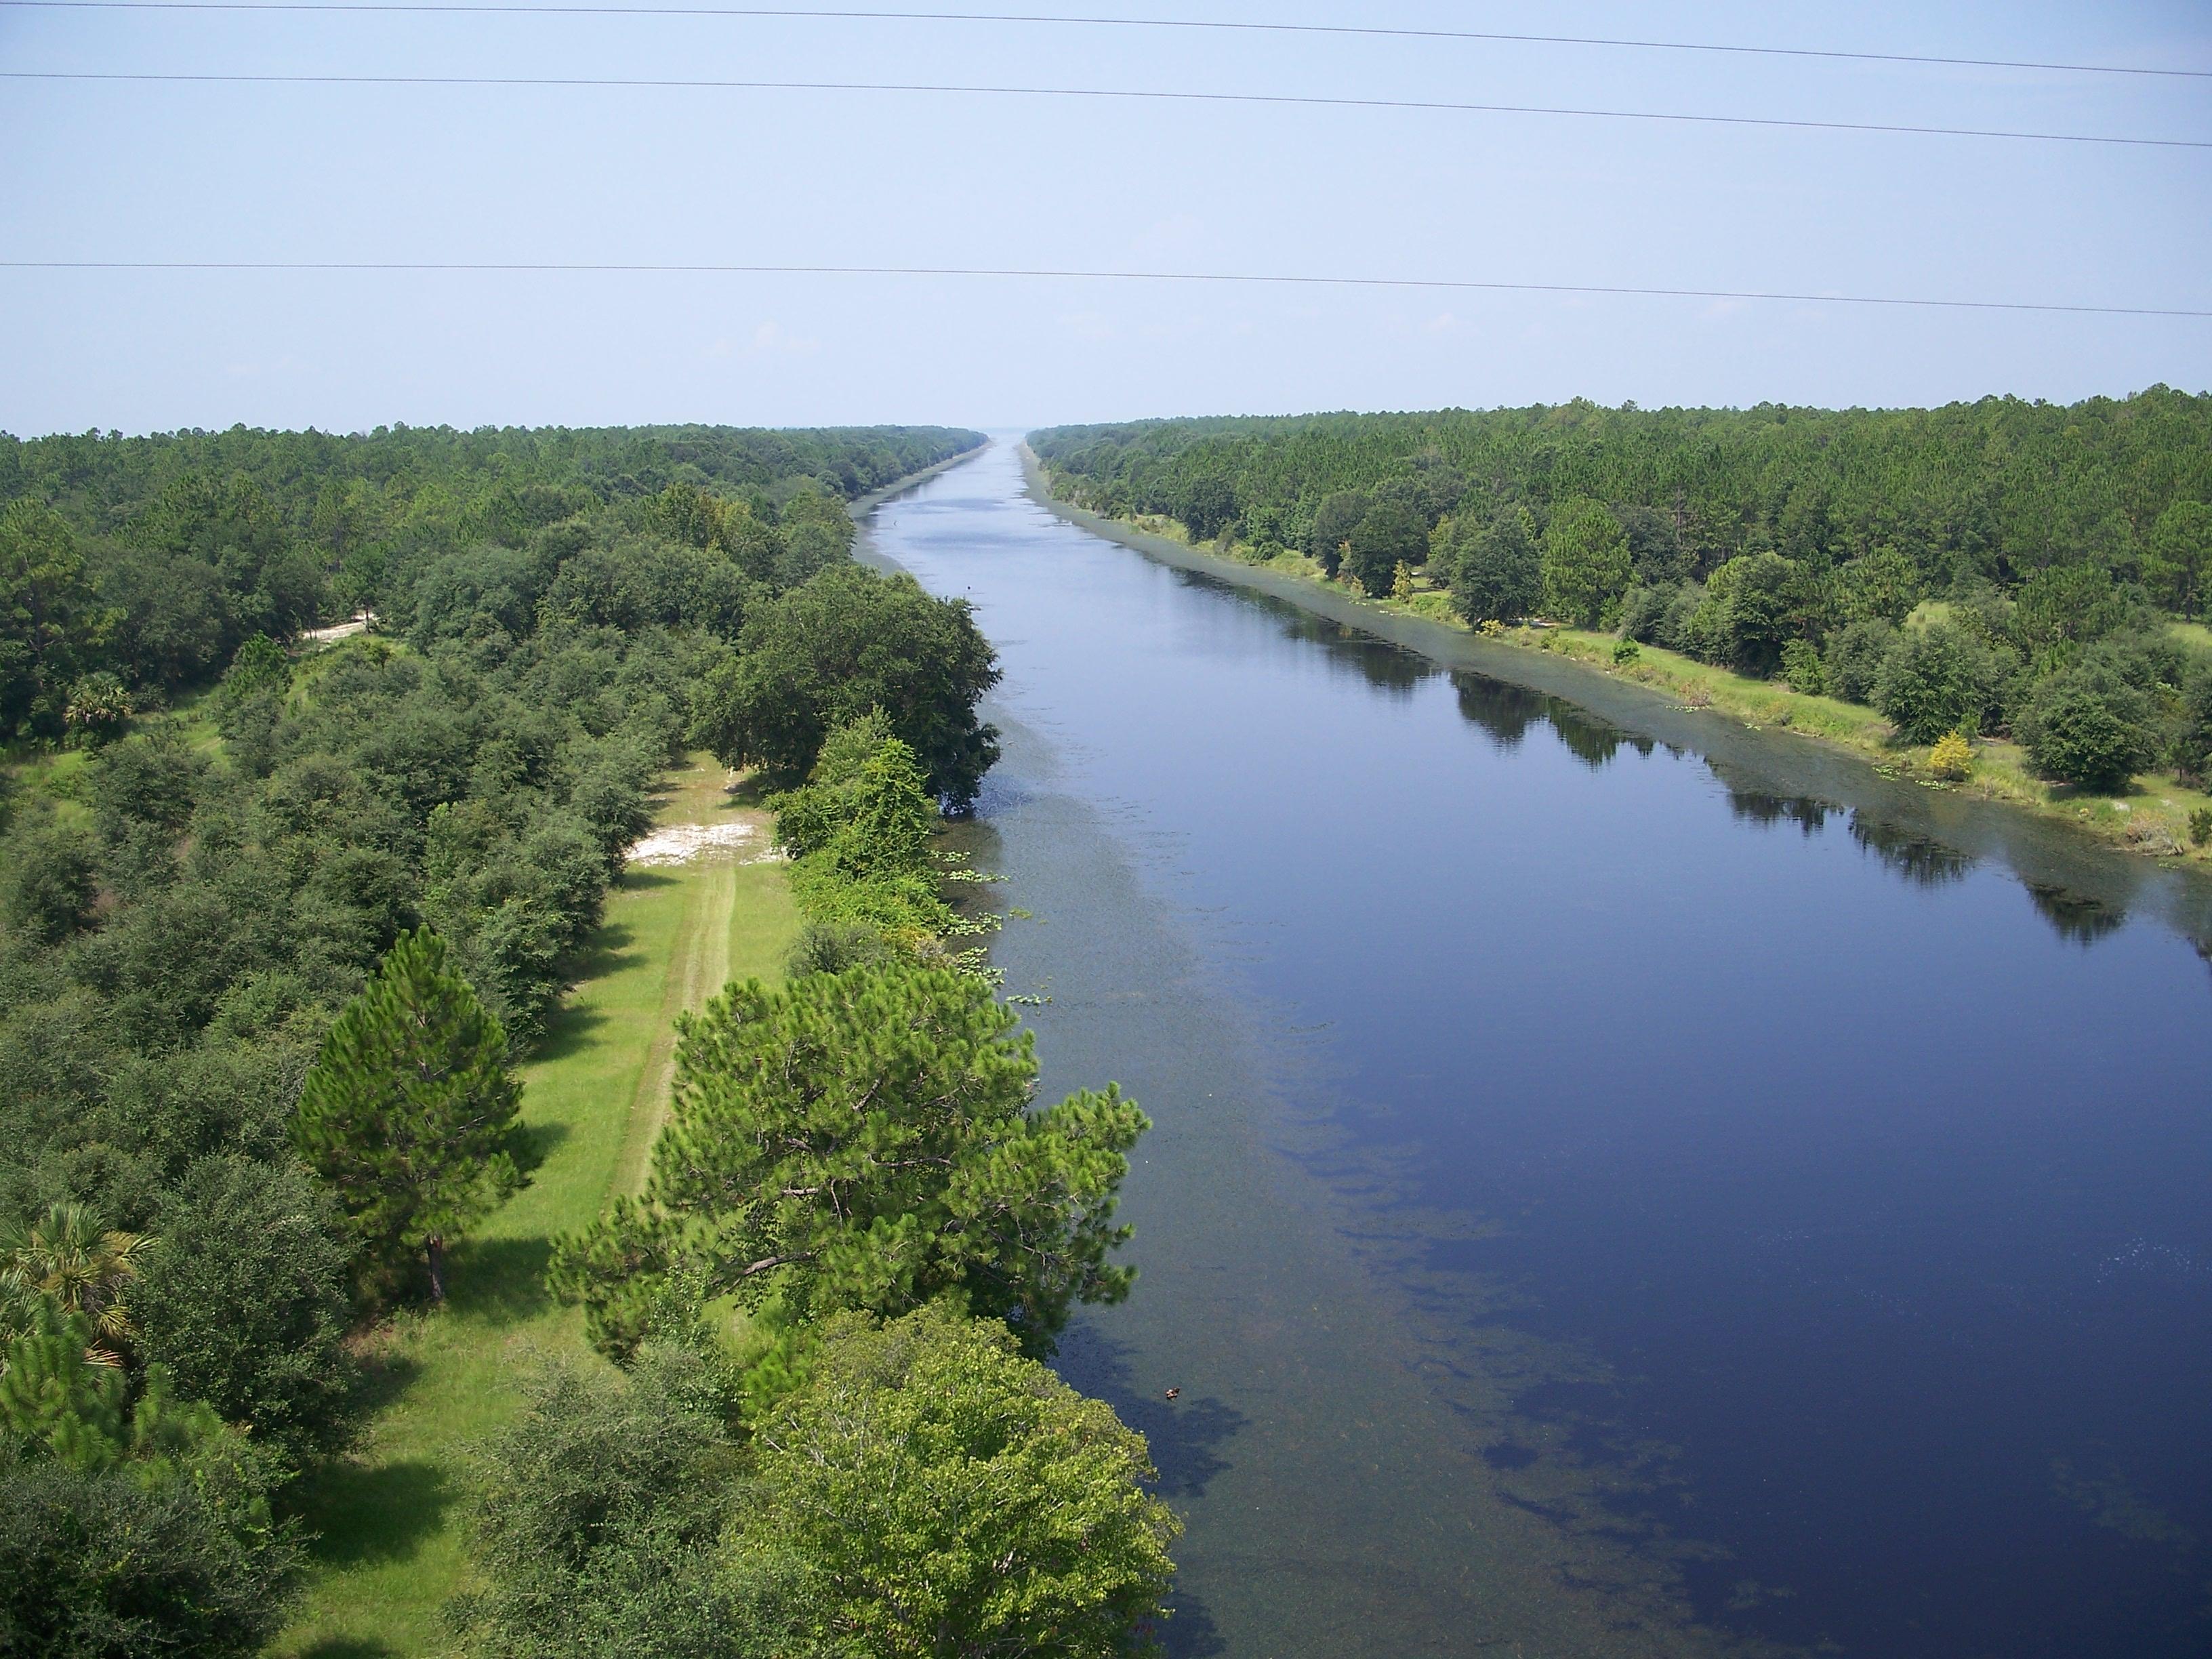 St. Johns River - Wikipedia, the free encyclopedia